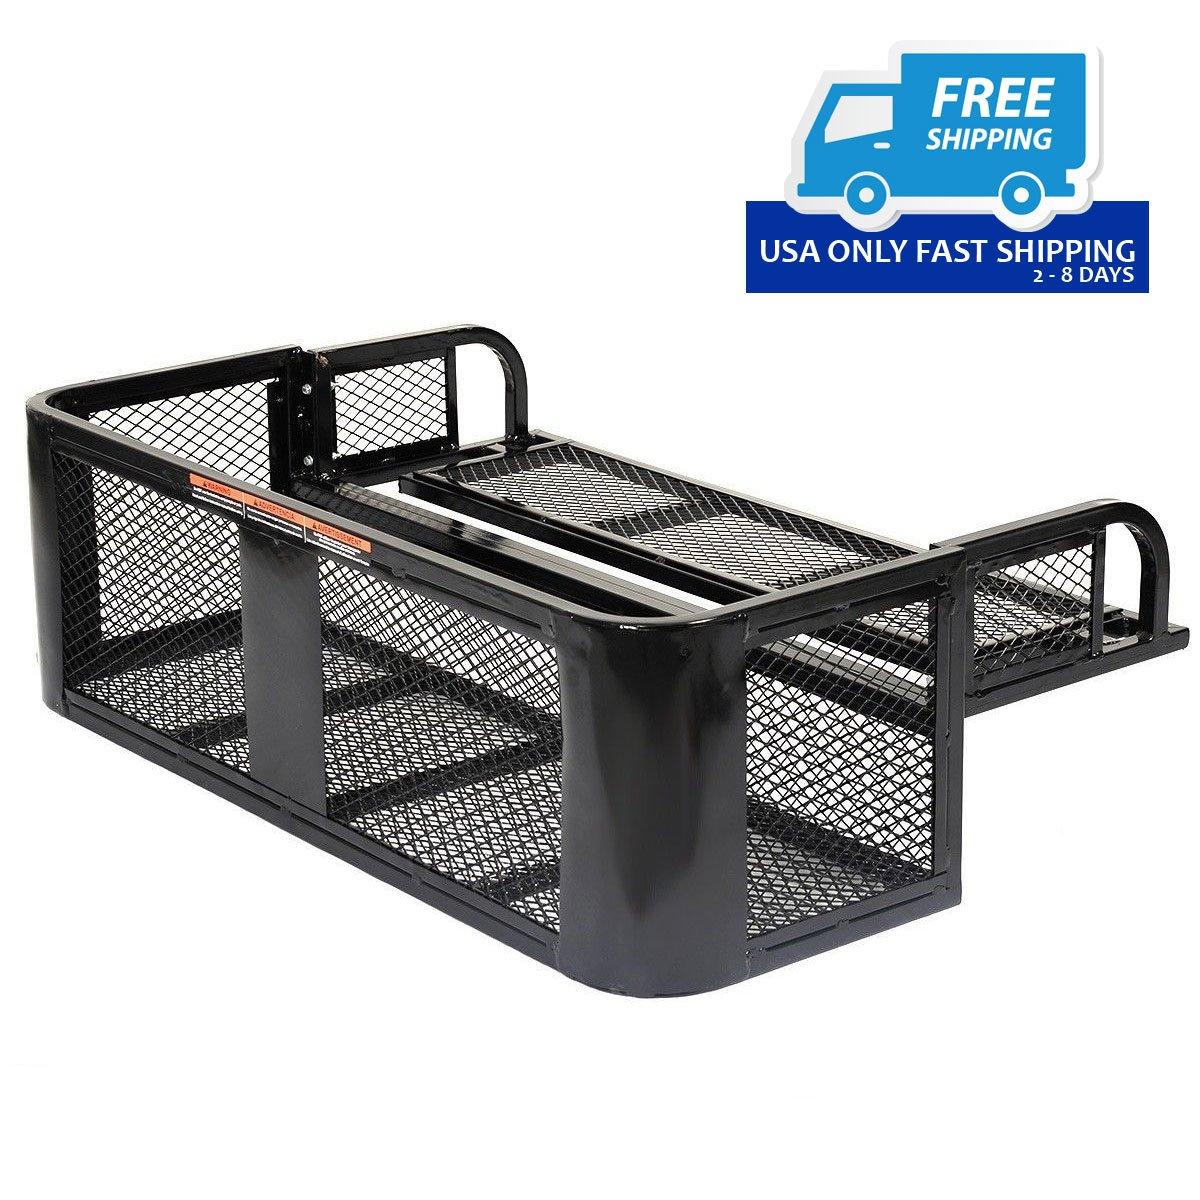 atv racks header rack in us baskets usa accessories baltic iron ironbaltic